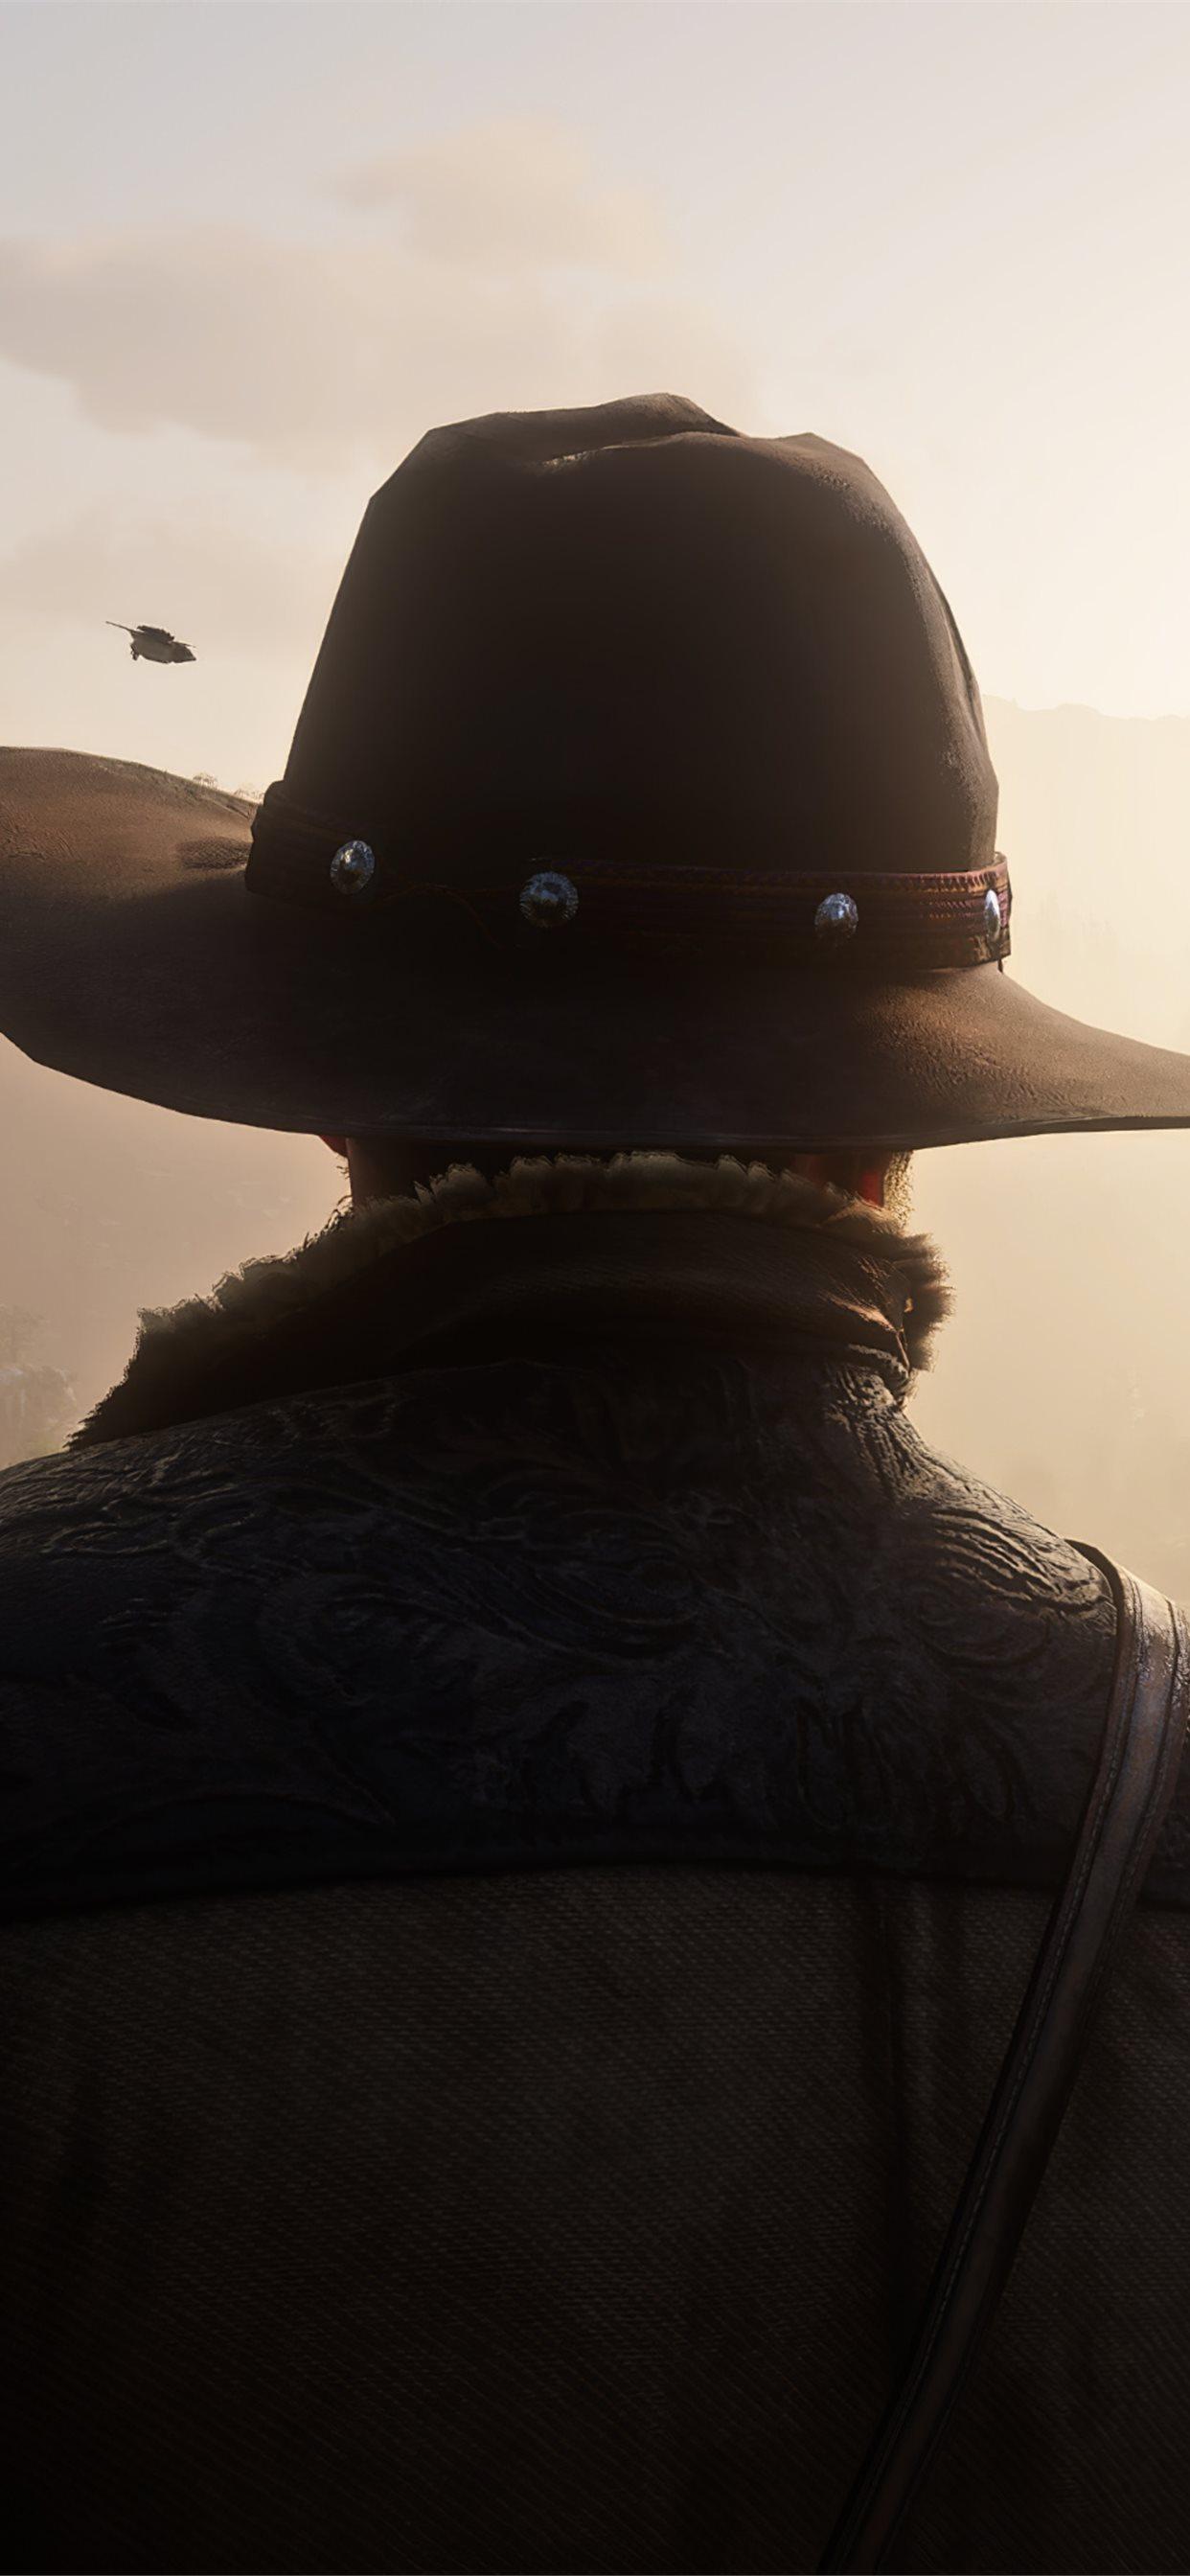 Red Dead Redemption 2 Wallpaper 4k Ios , HD Wallpaper & Backgrounds